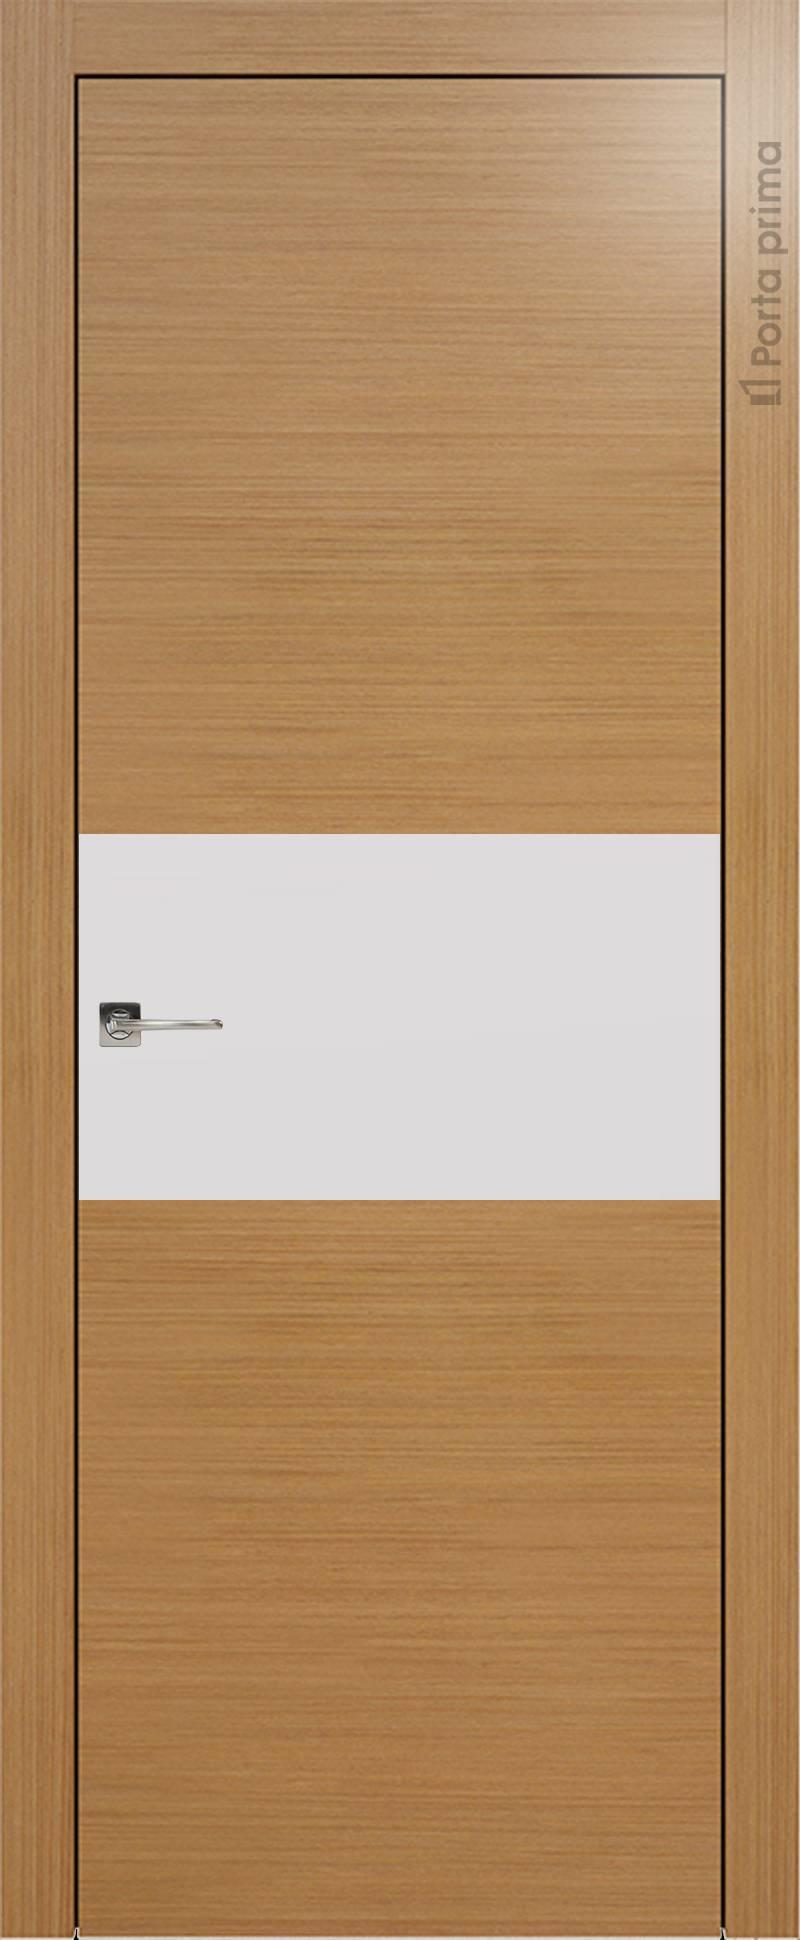 Tivoli Е-4 цвет - Миланский орех Без стекла (ДГ)